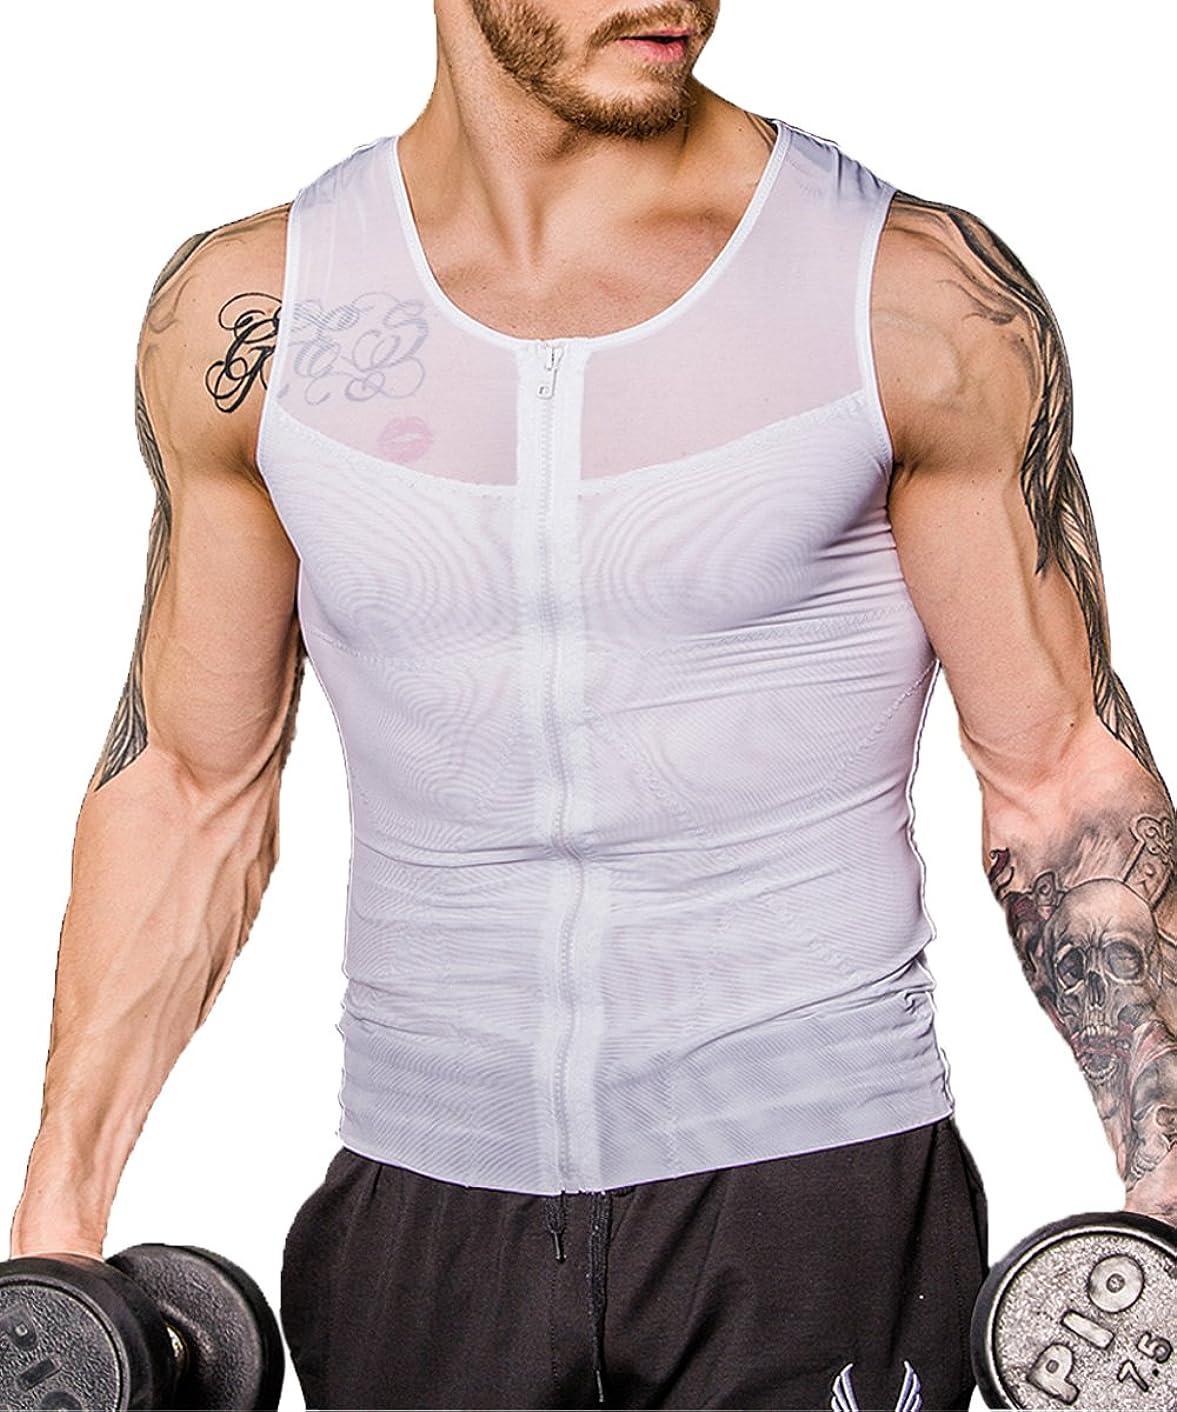 Shaxea Zipper Men's Strong Compression Shirt to Hide Gynecomastia Body Shaper Chest Slimming Body Shaper fit Undershirt